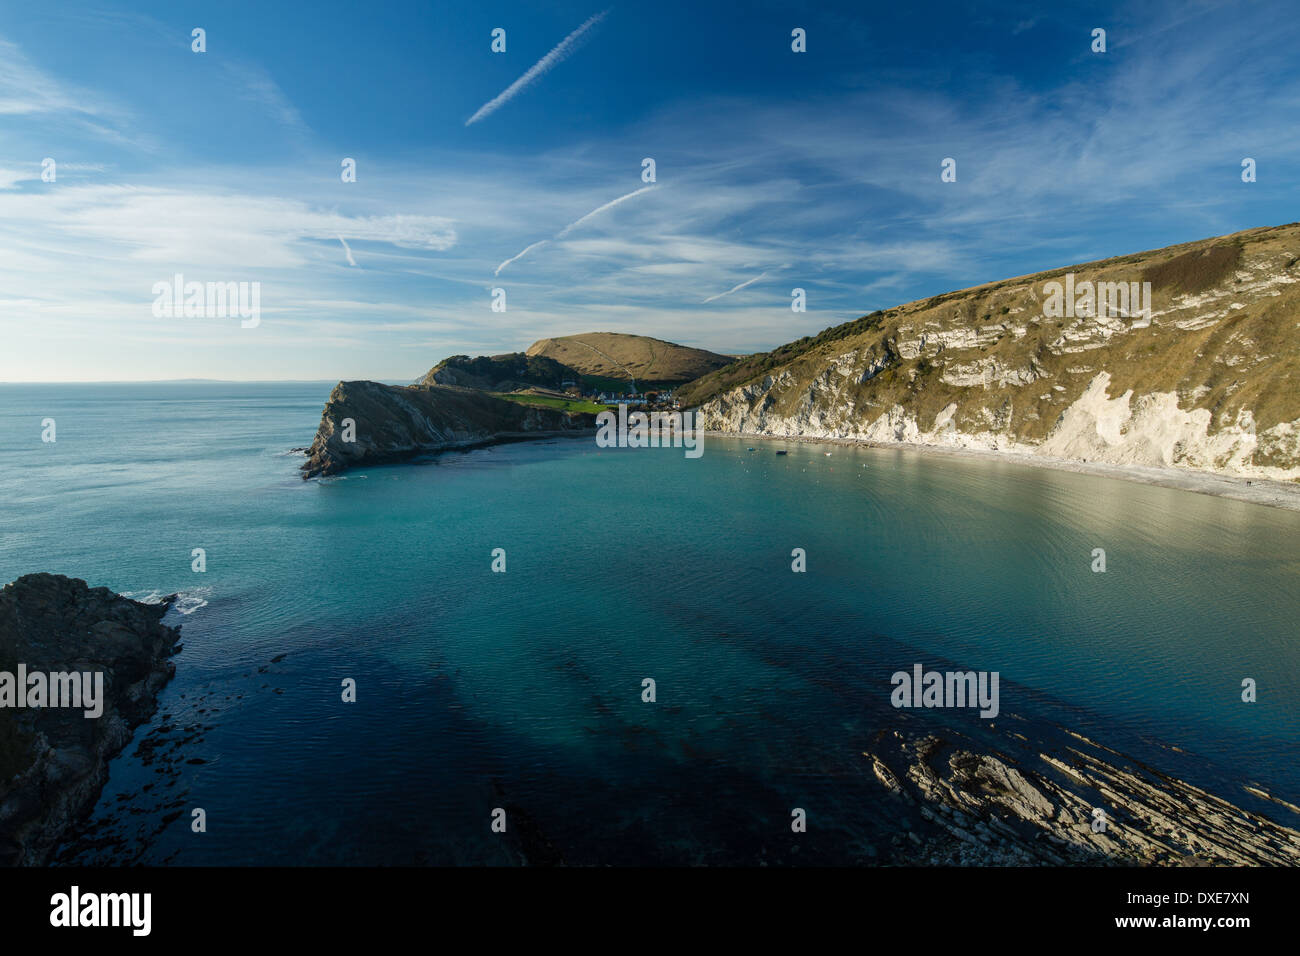 Lulworth Cove, la Costa Jurásica, en Dorset, Inglaterra Foto de stock